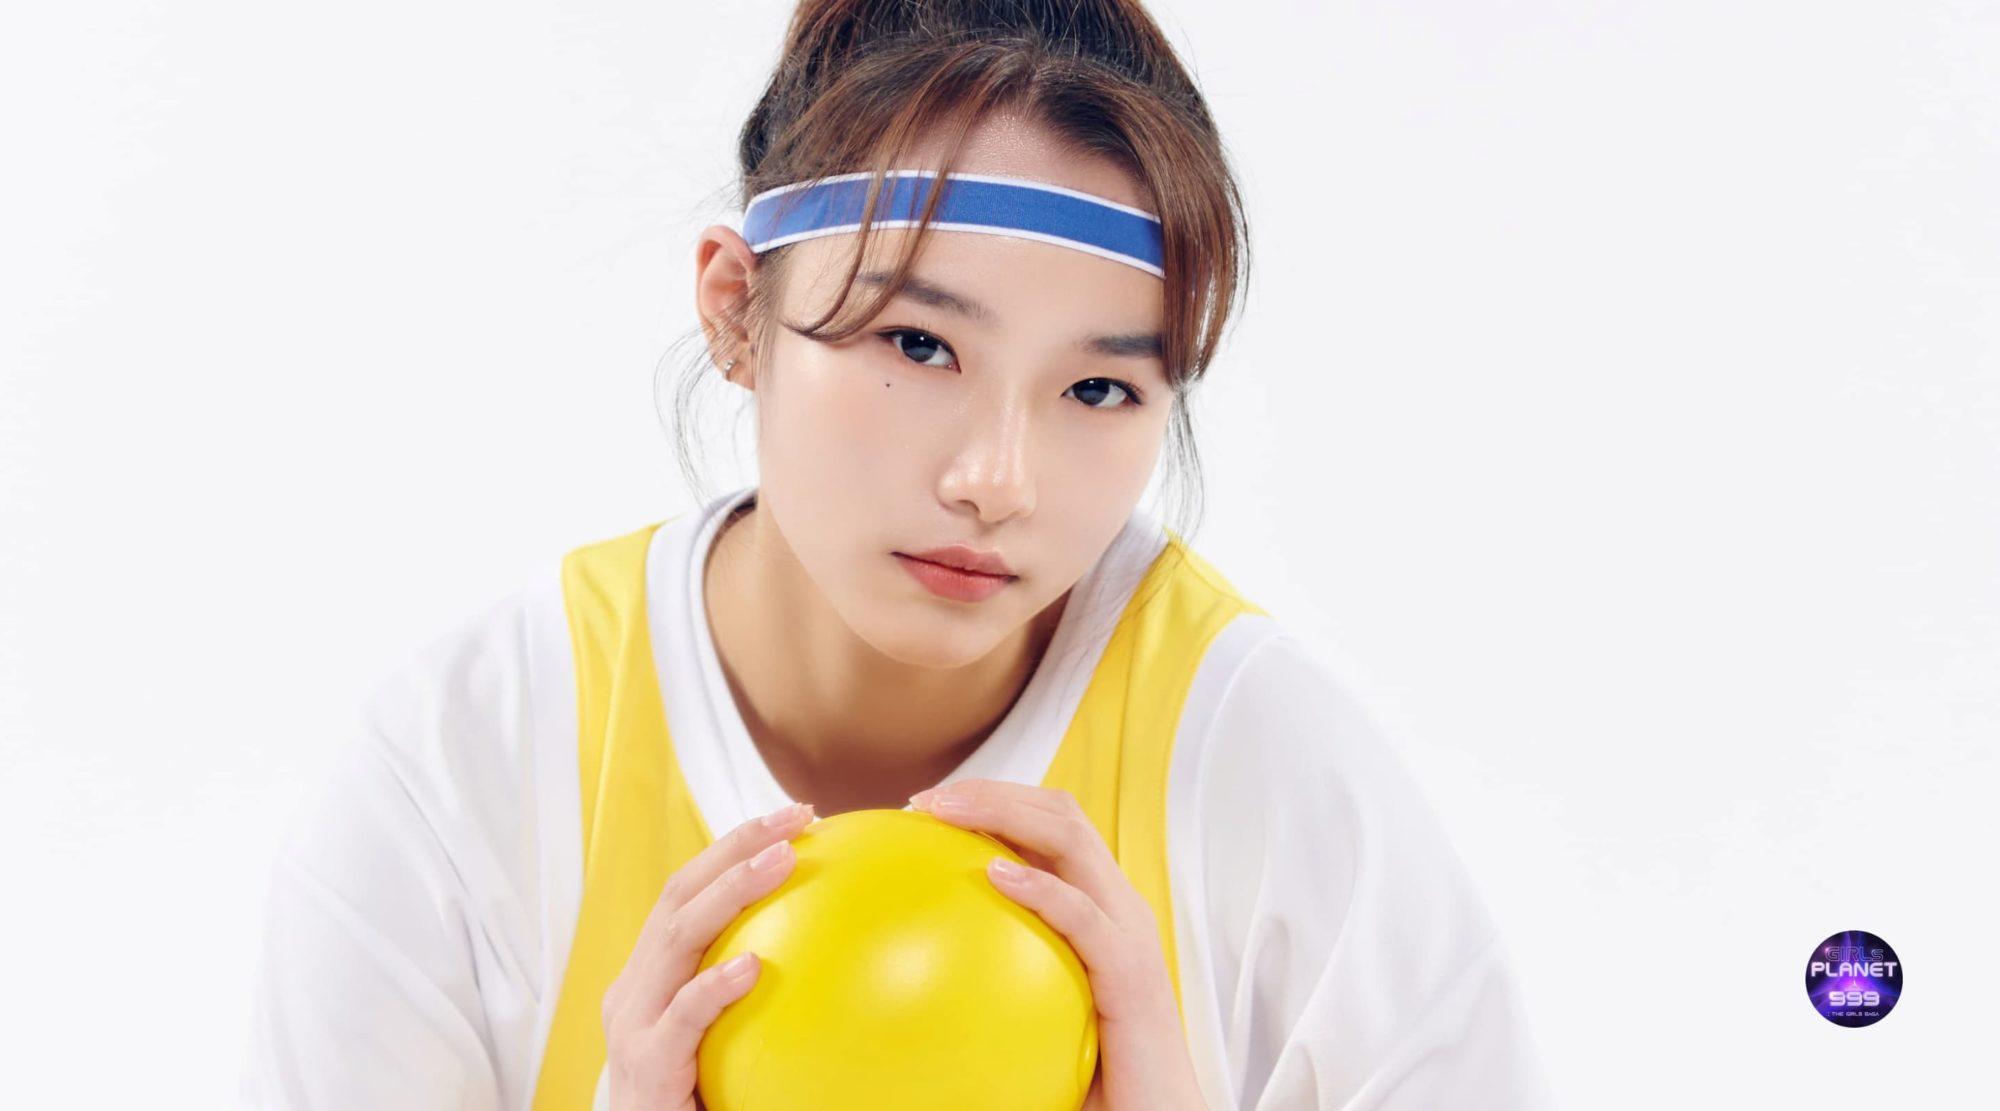 Ma Yu Ling Girls Planet 999